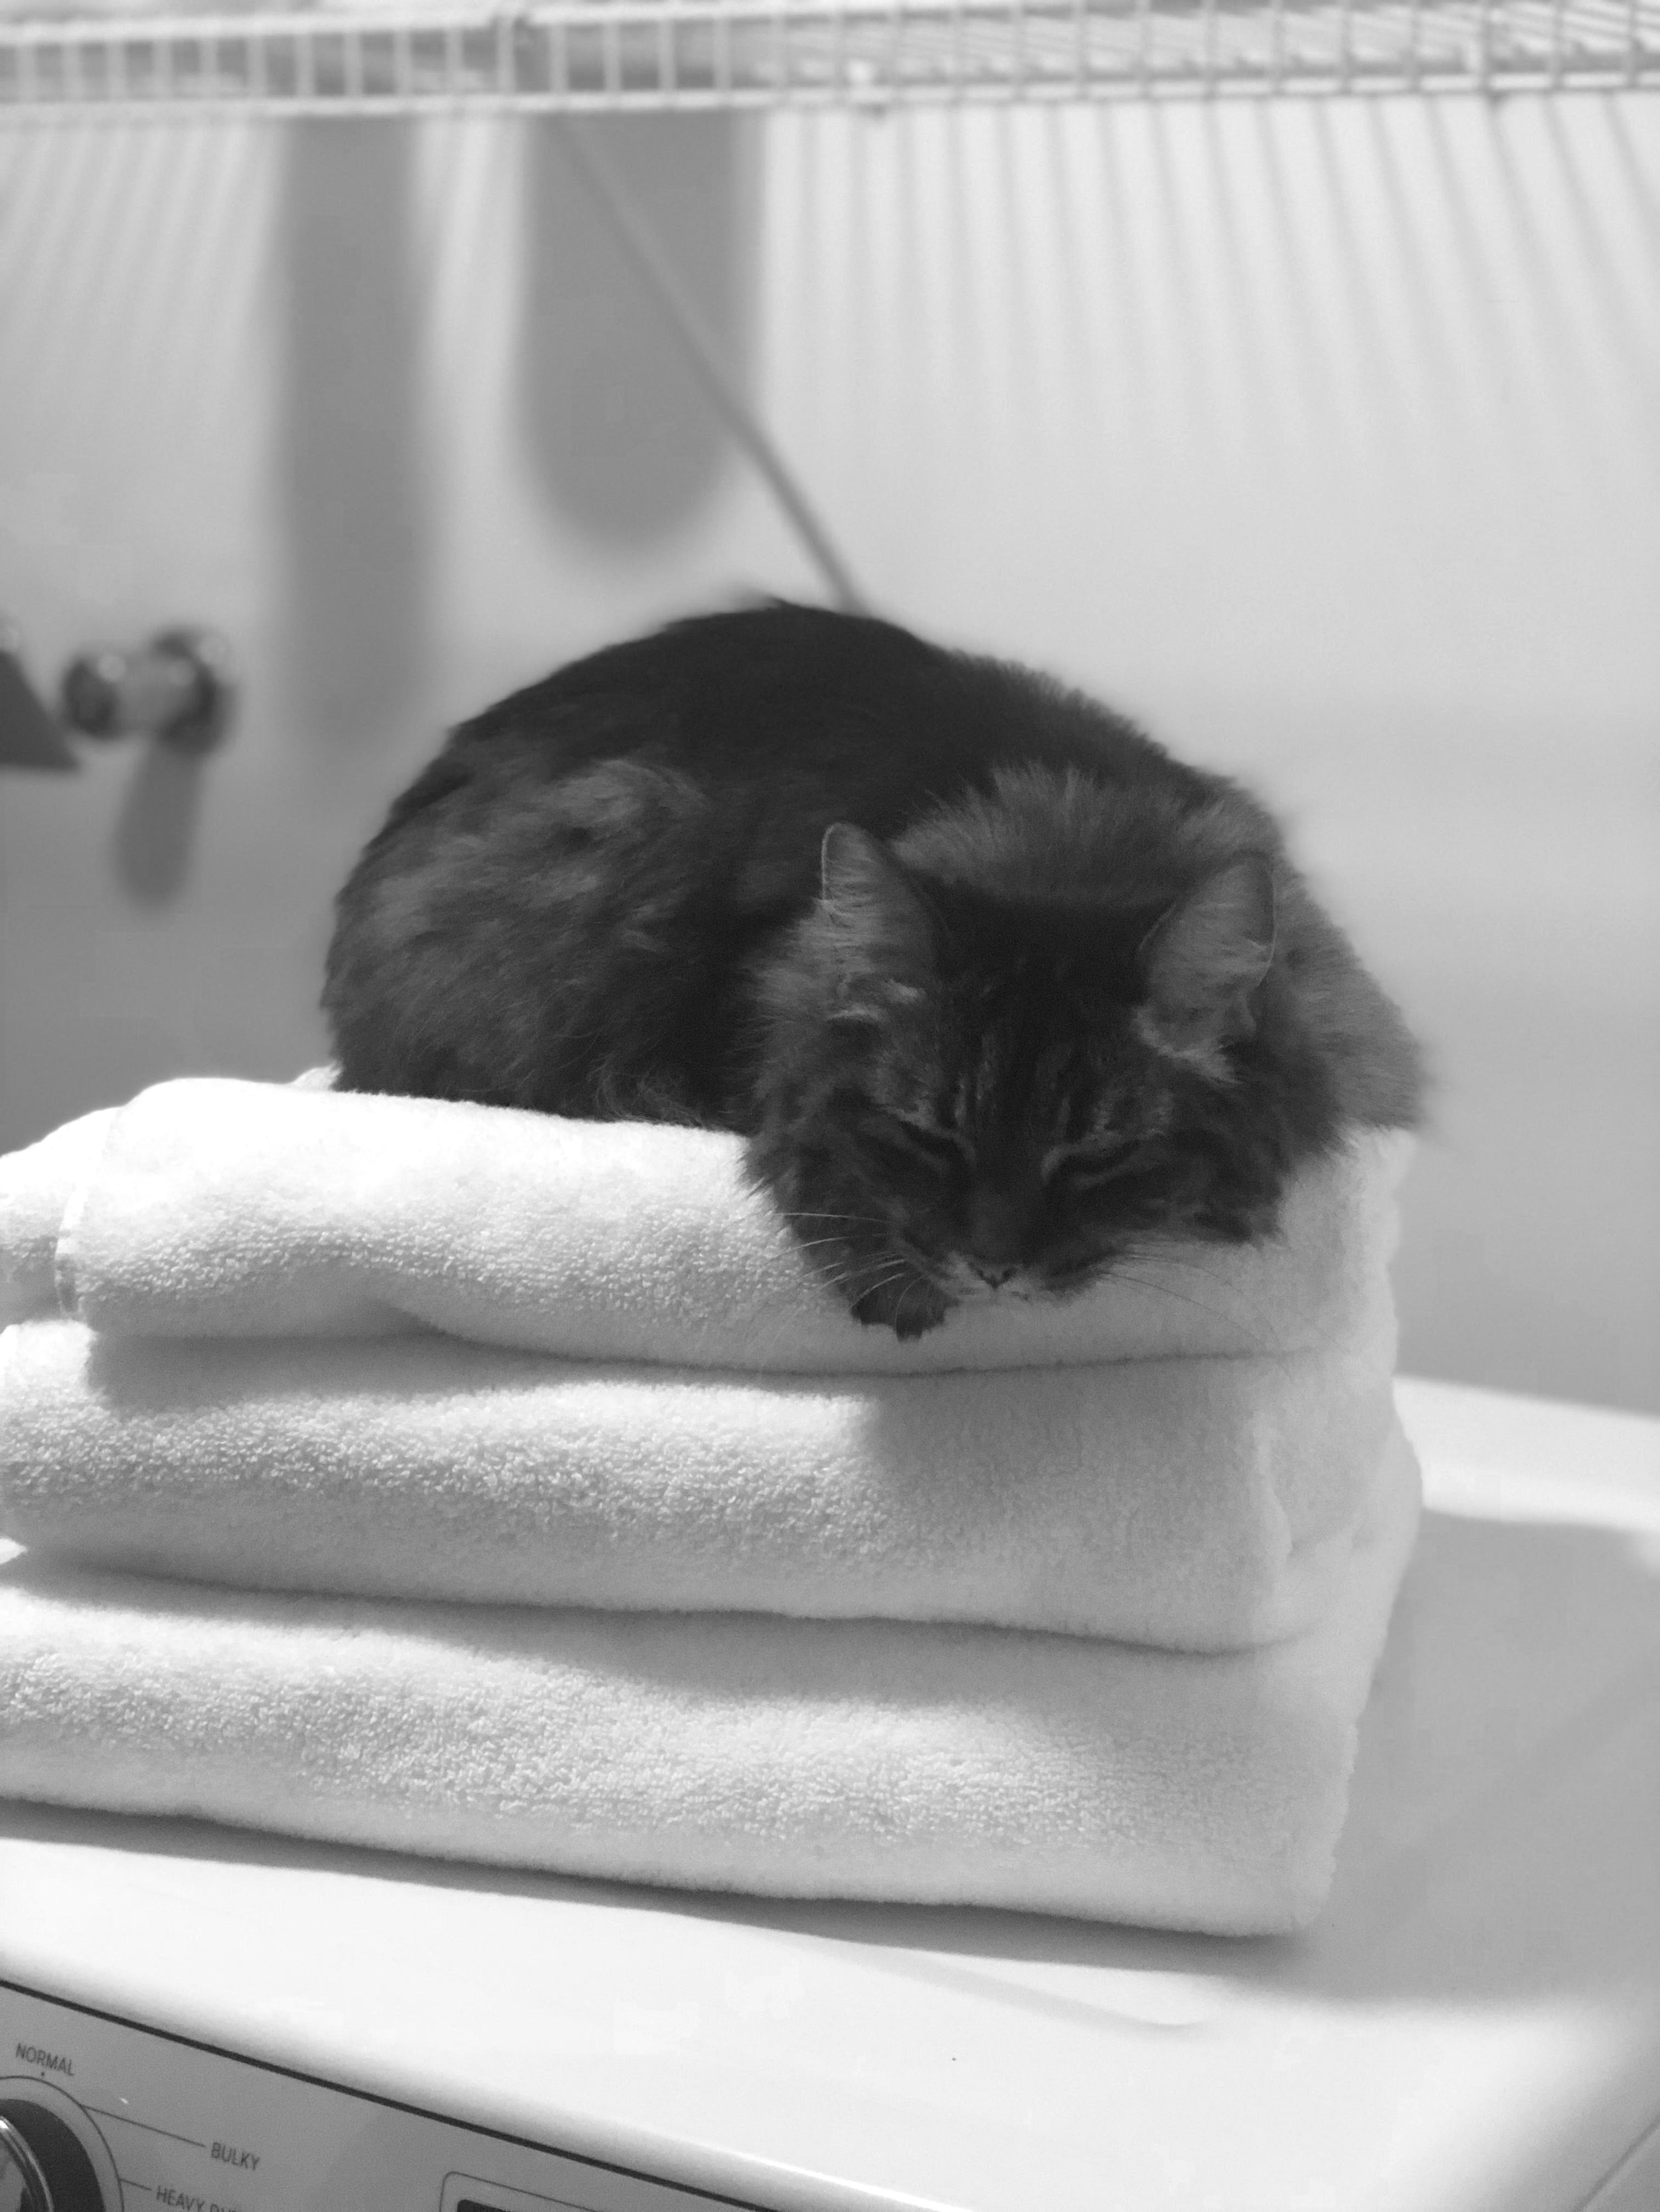 JD's cat, Mips, bastard long-hair breed.